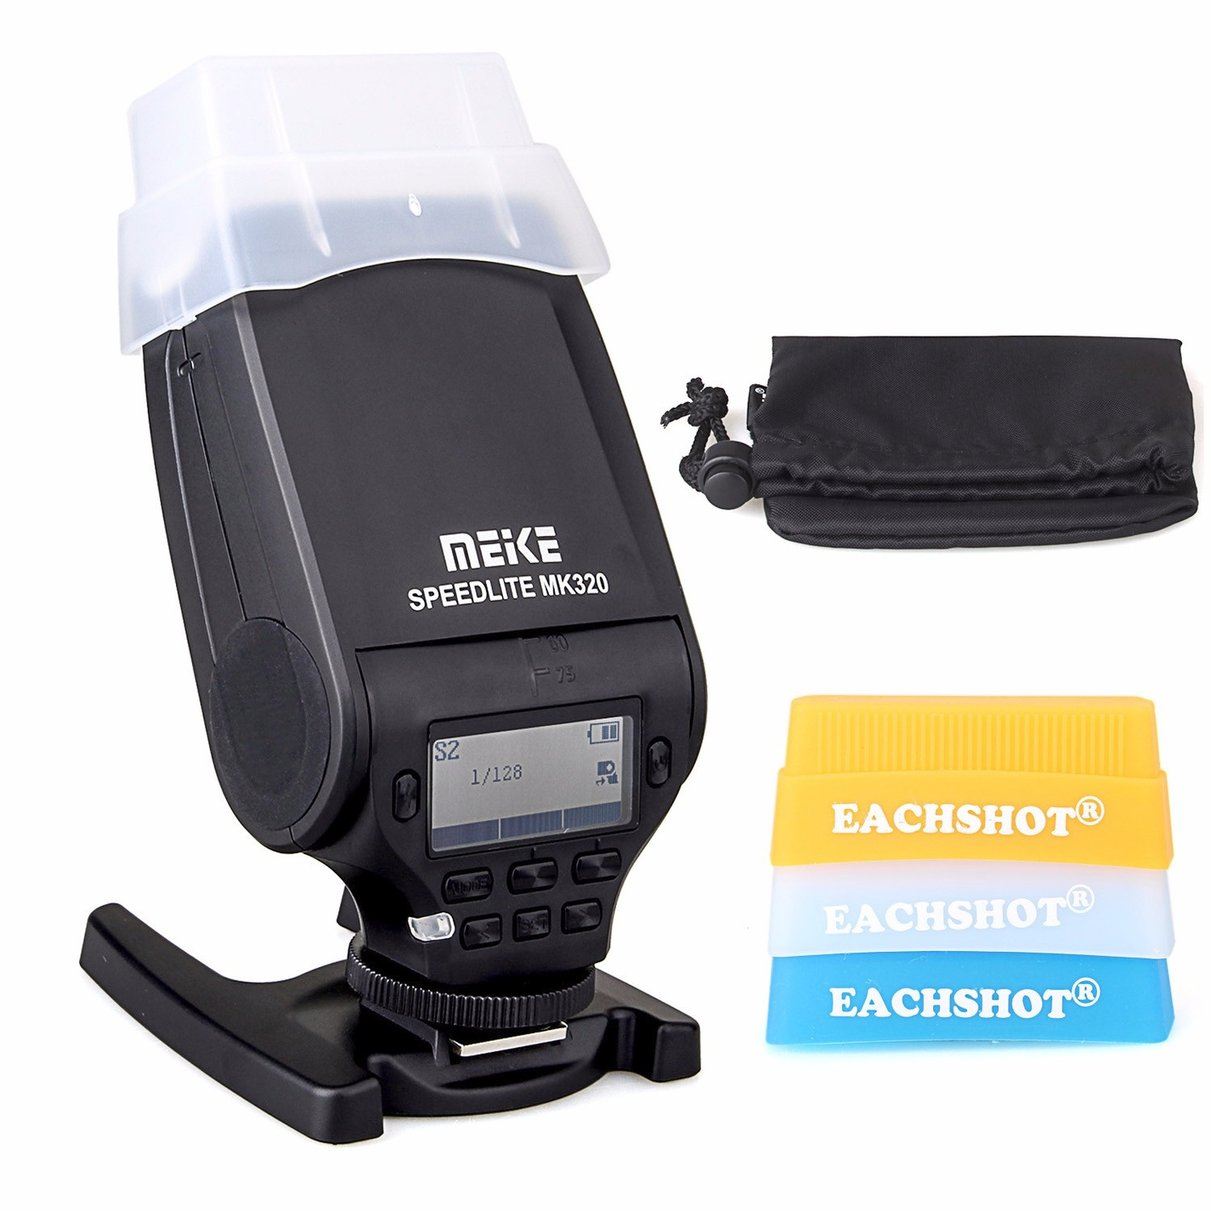 MEIKE MK-320 MK320 TTL flash Speedlite za Sony A7 III A7III A9 A7 A7 II A7S A7R A6000 A5000 NEX-7